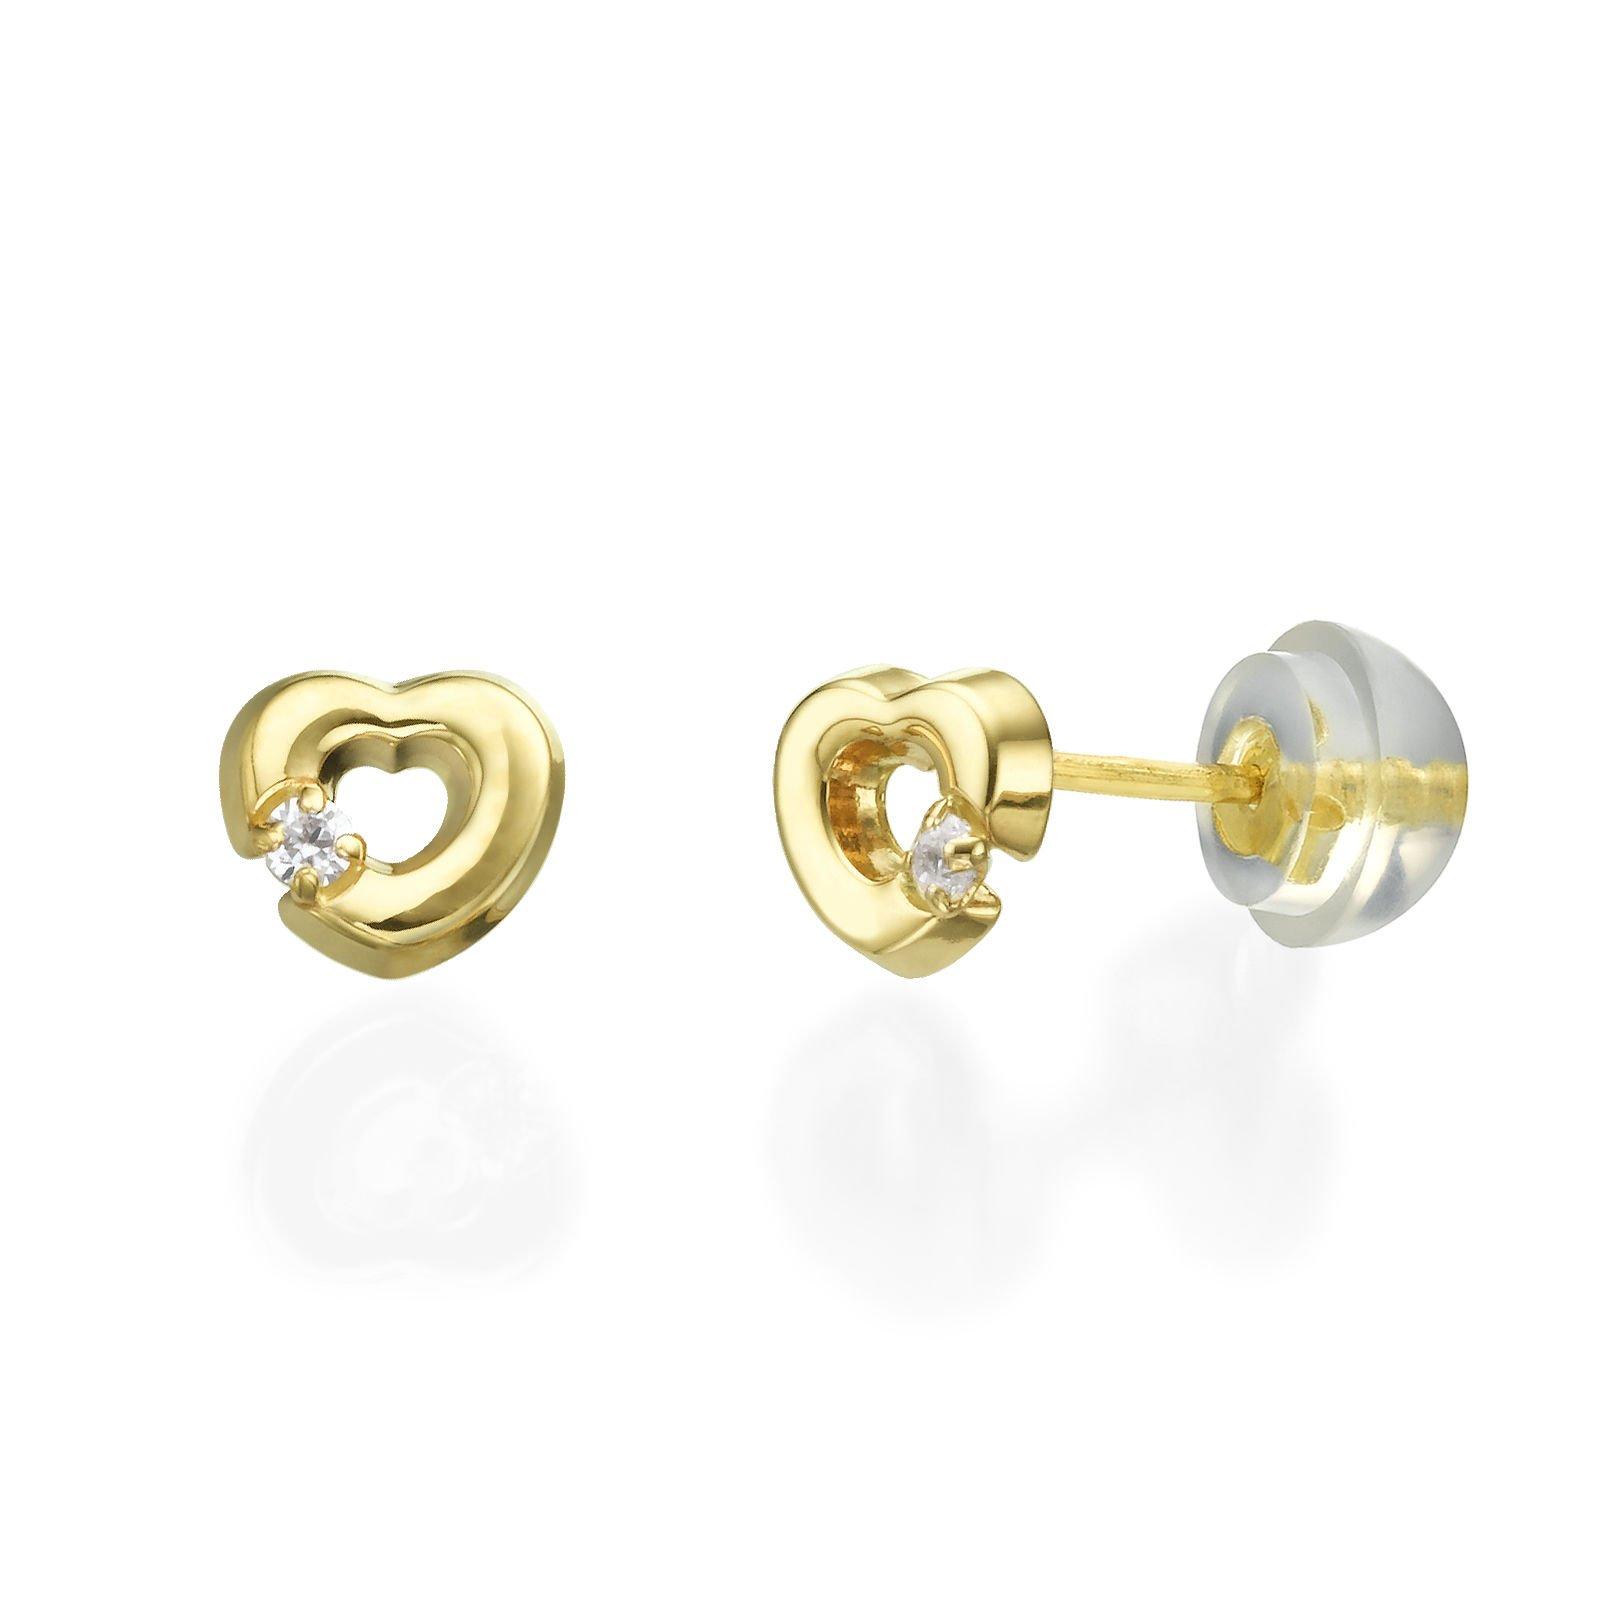 14K Fine Yellow Gold Cubic Zirconia Heart Screw Back Stud Earrings for Girls Children Kids Gift